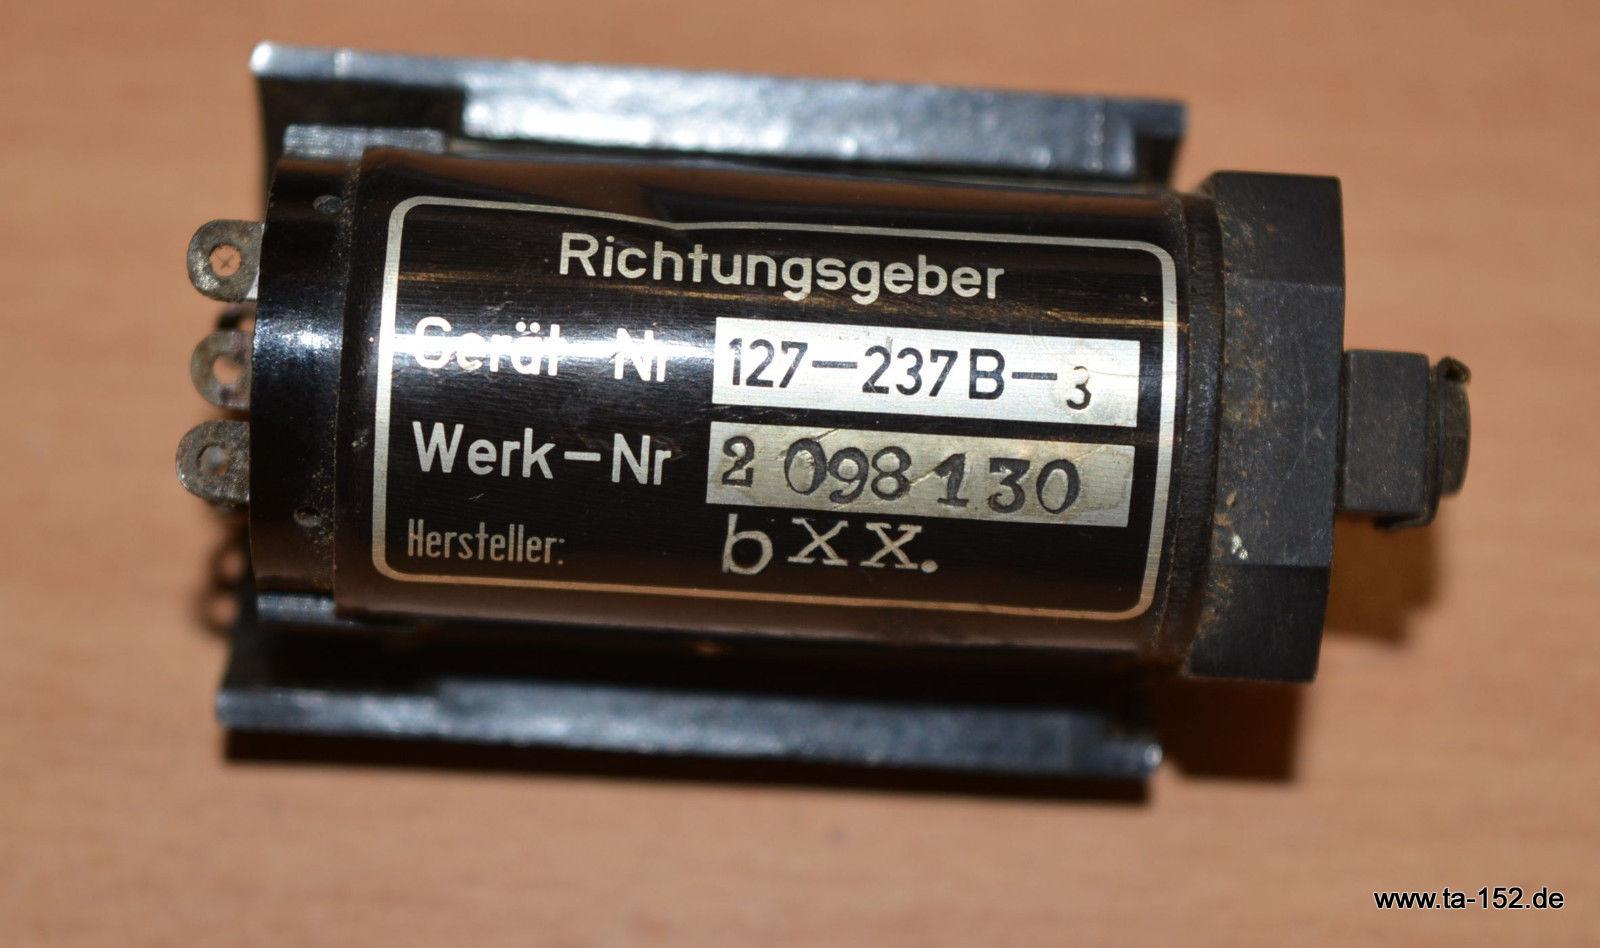 Richtungsgeber Gerät-Nr 127-237 B_02